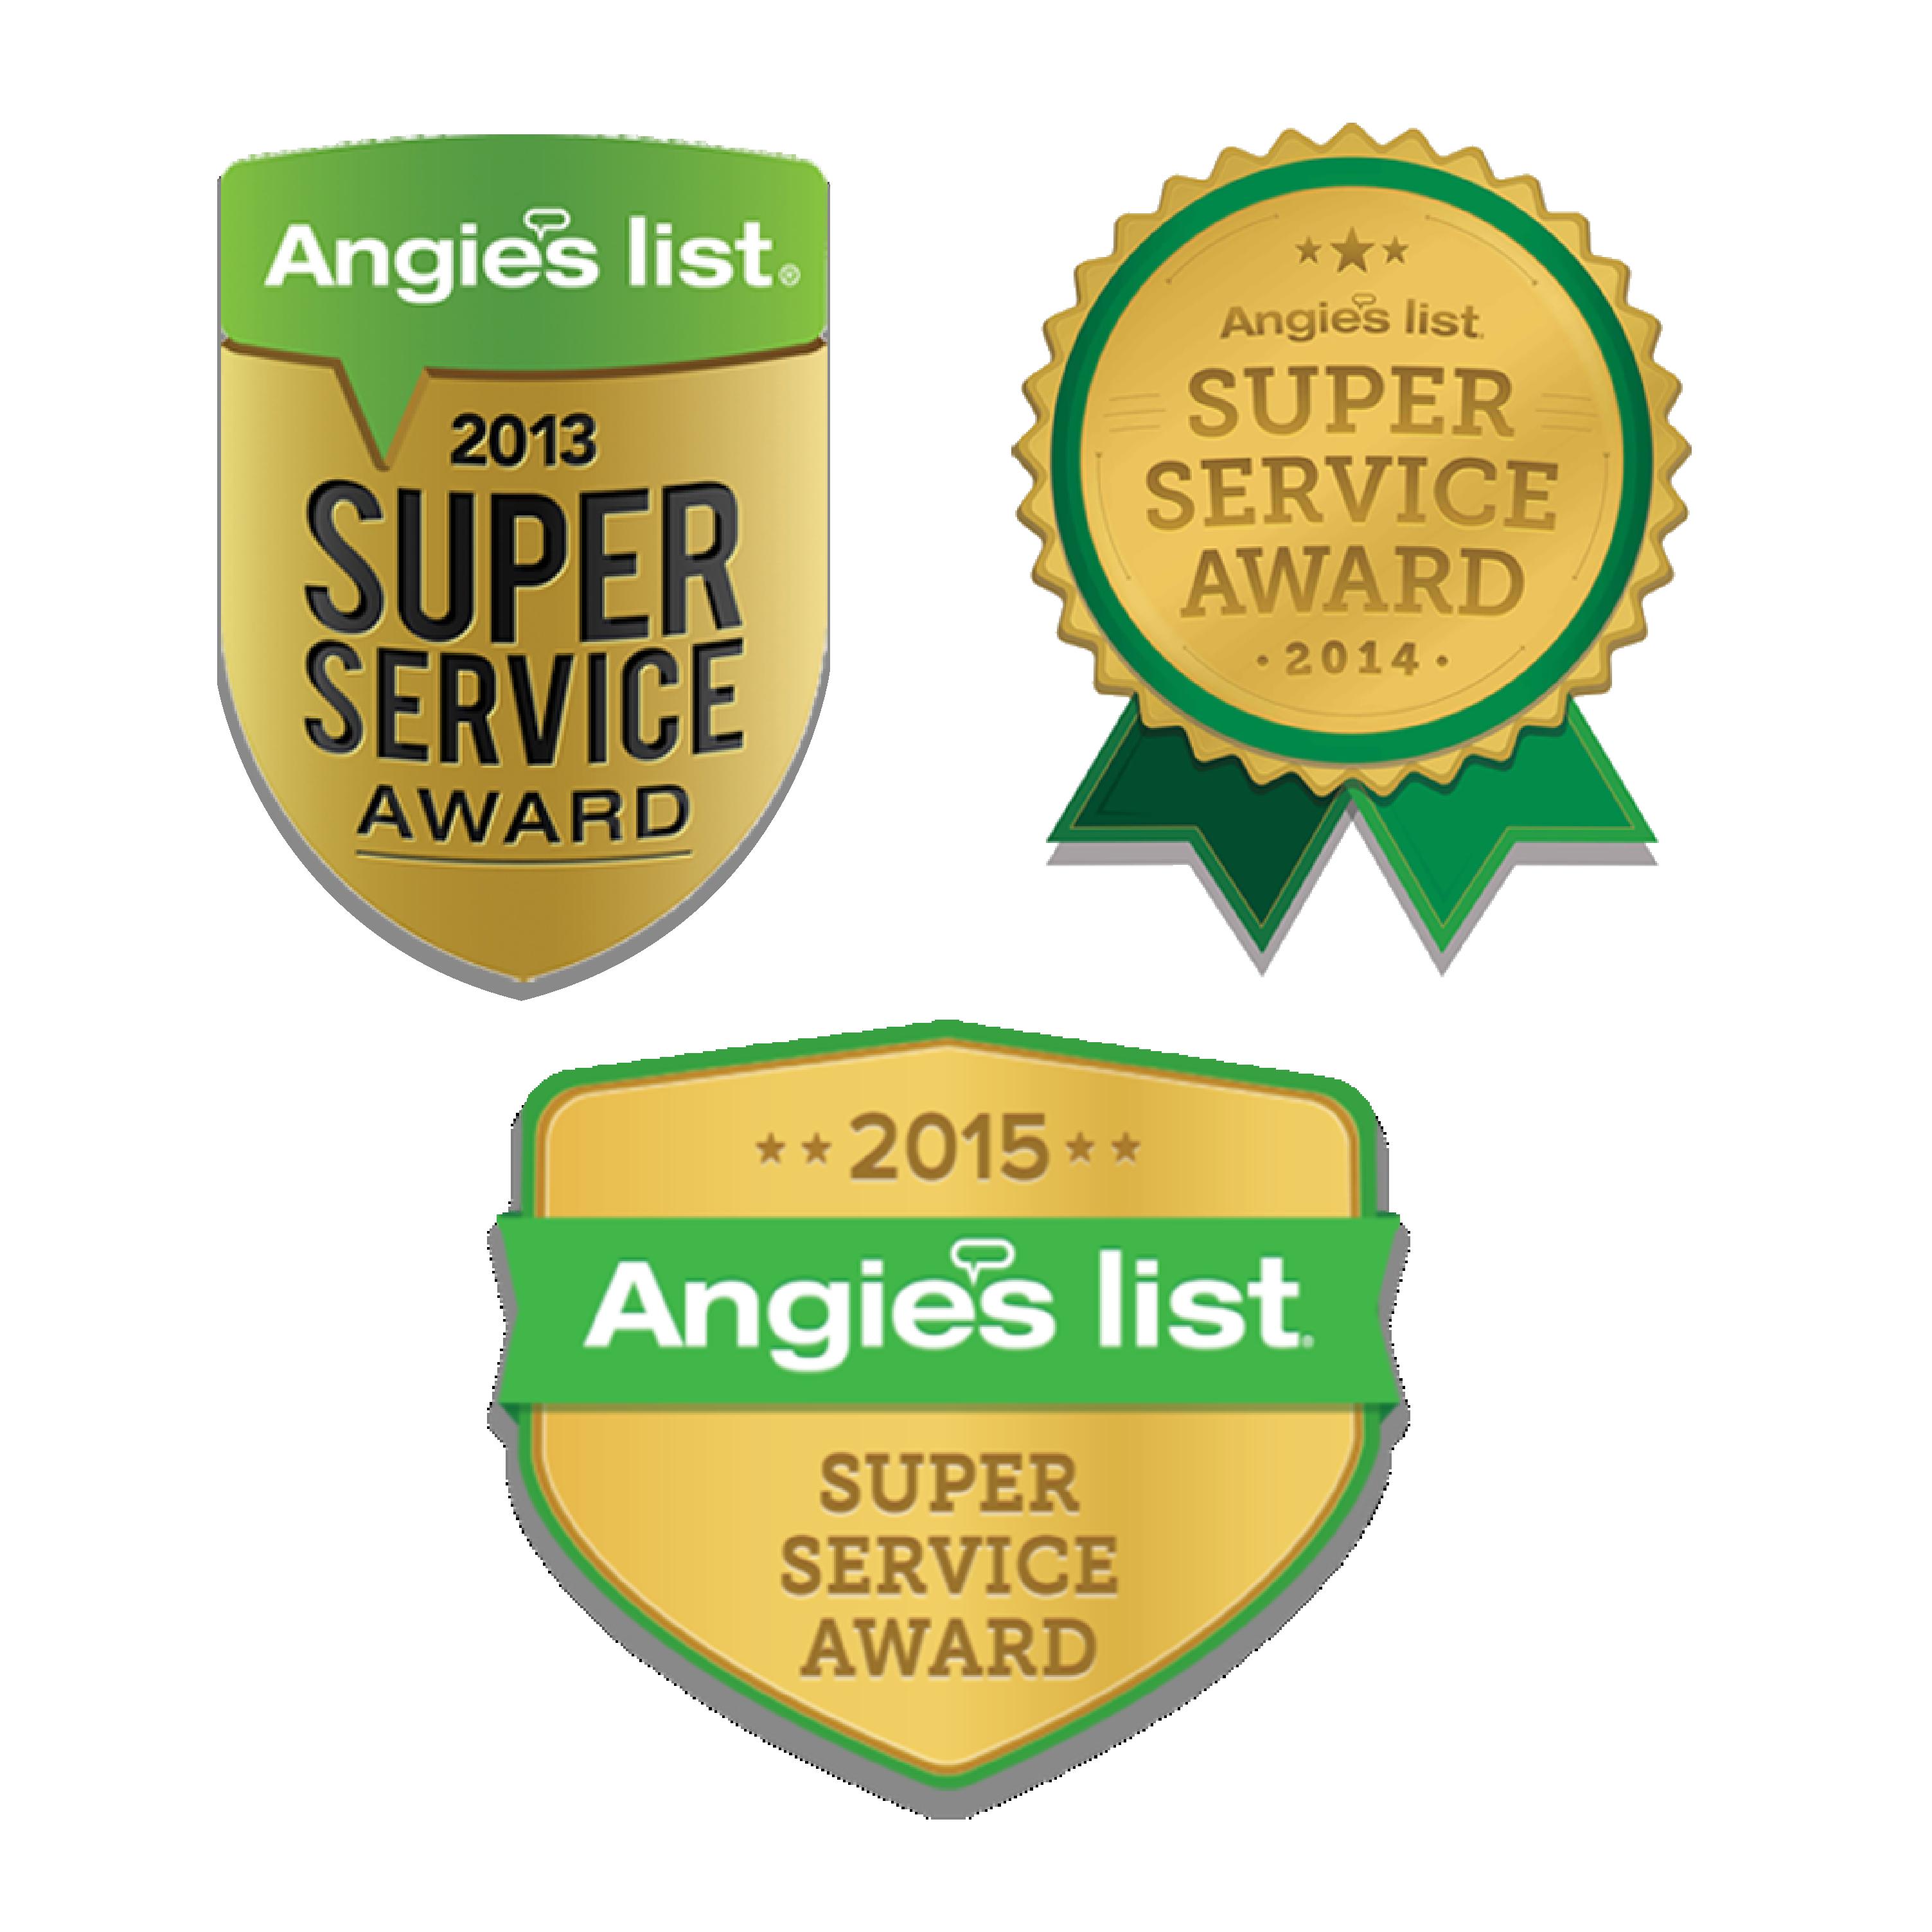 angies_list_span-01